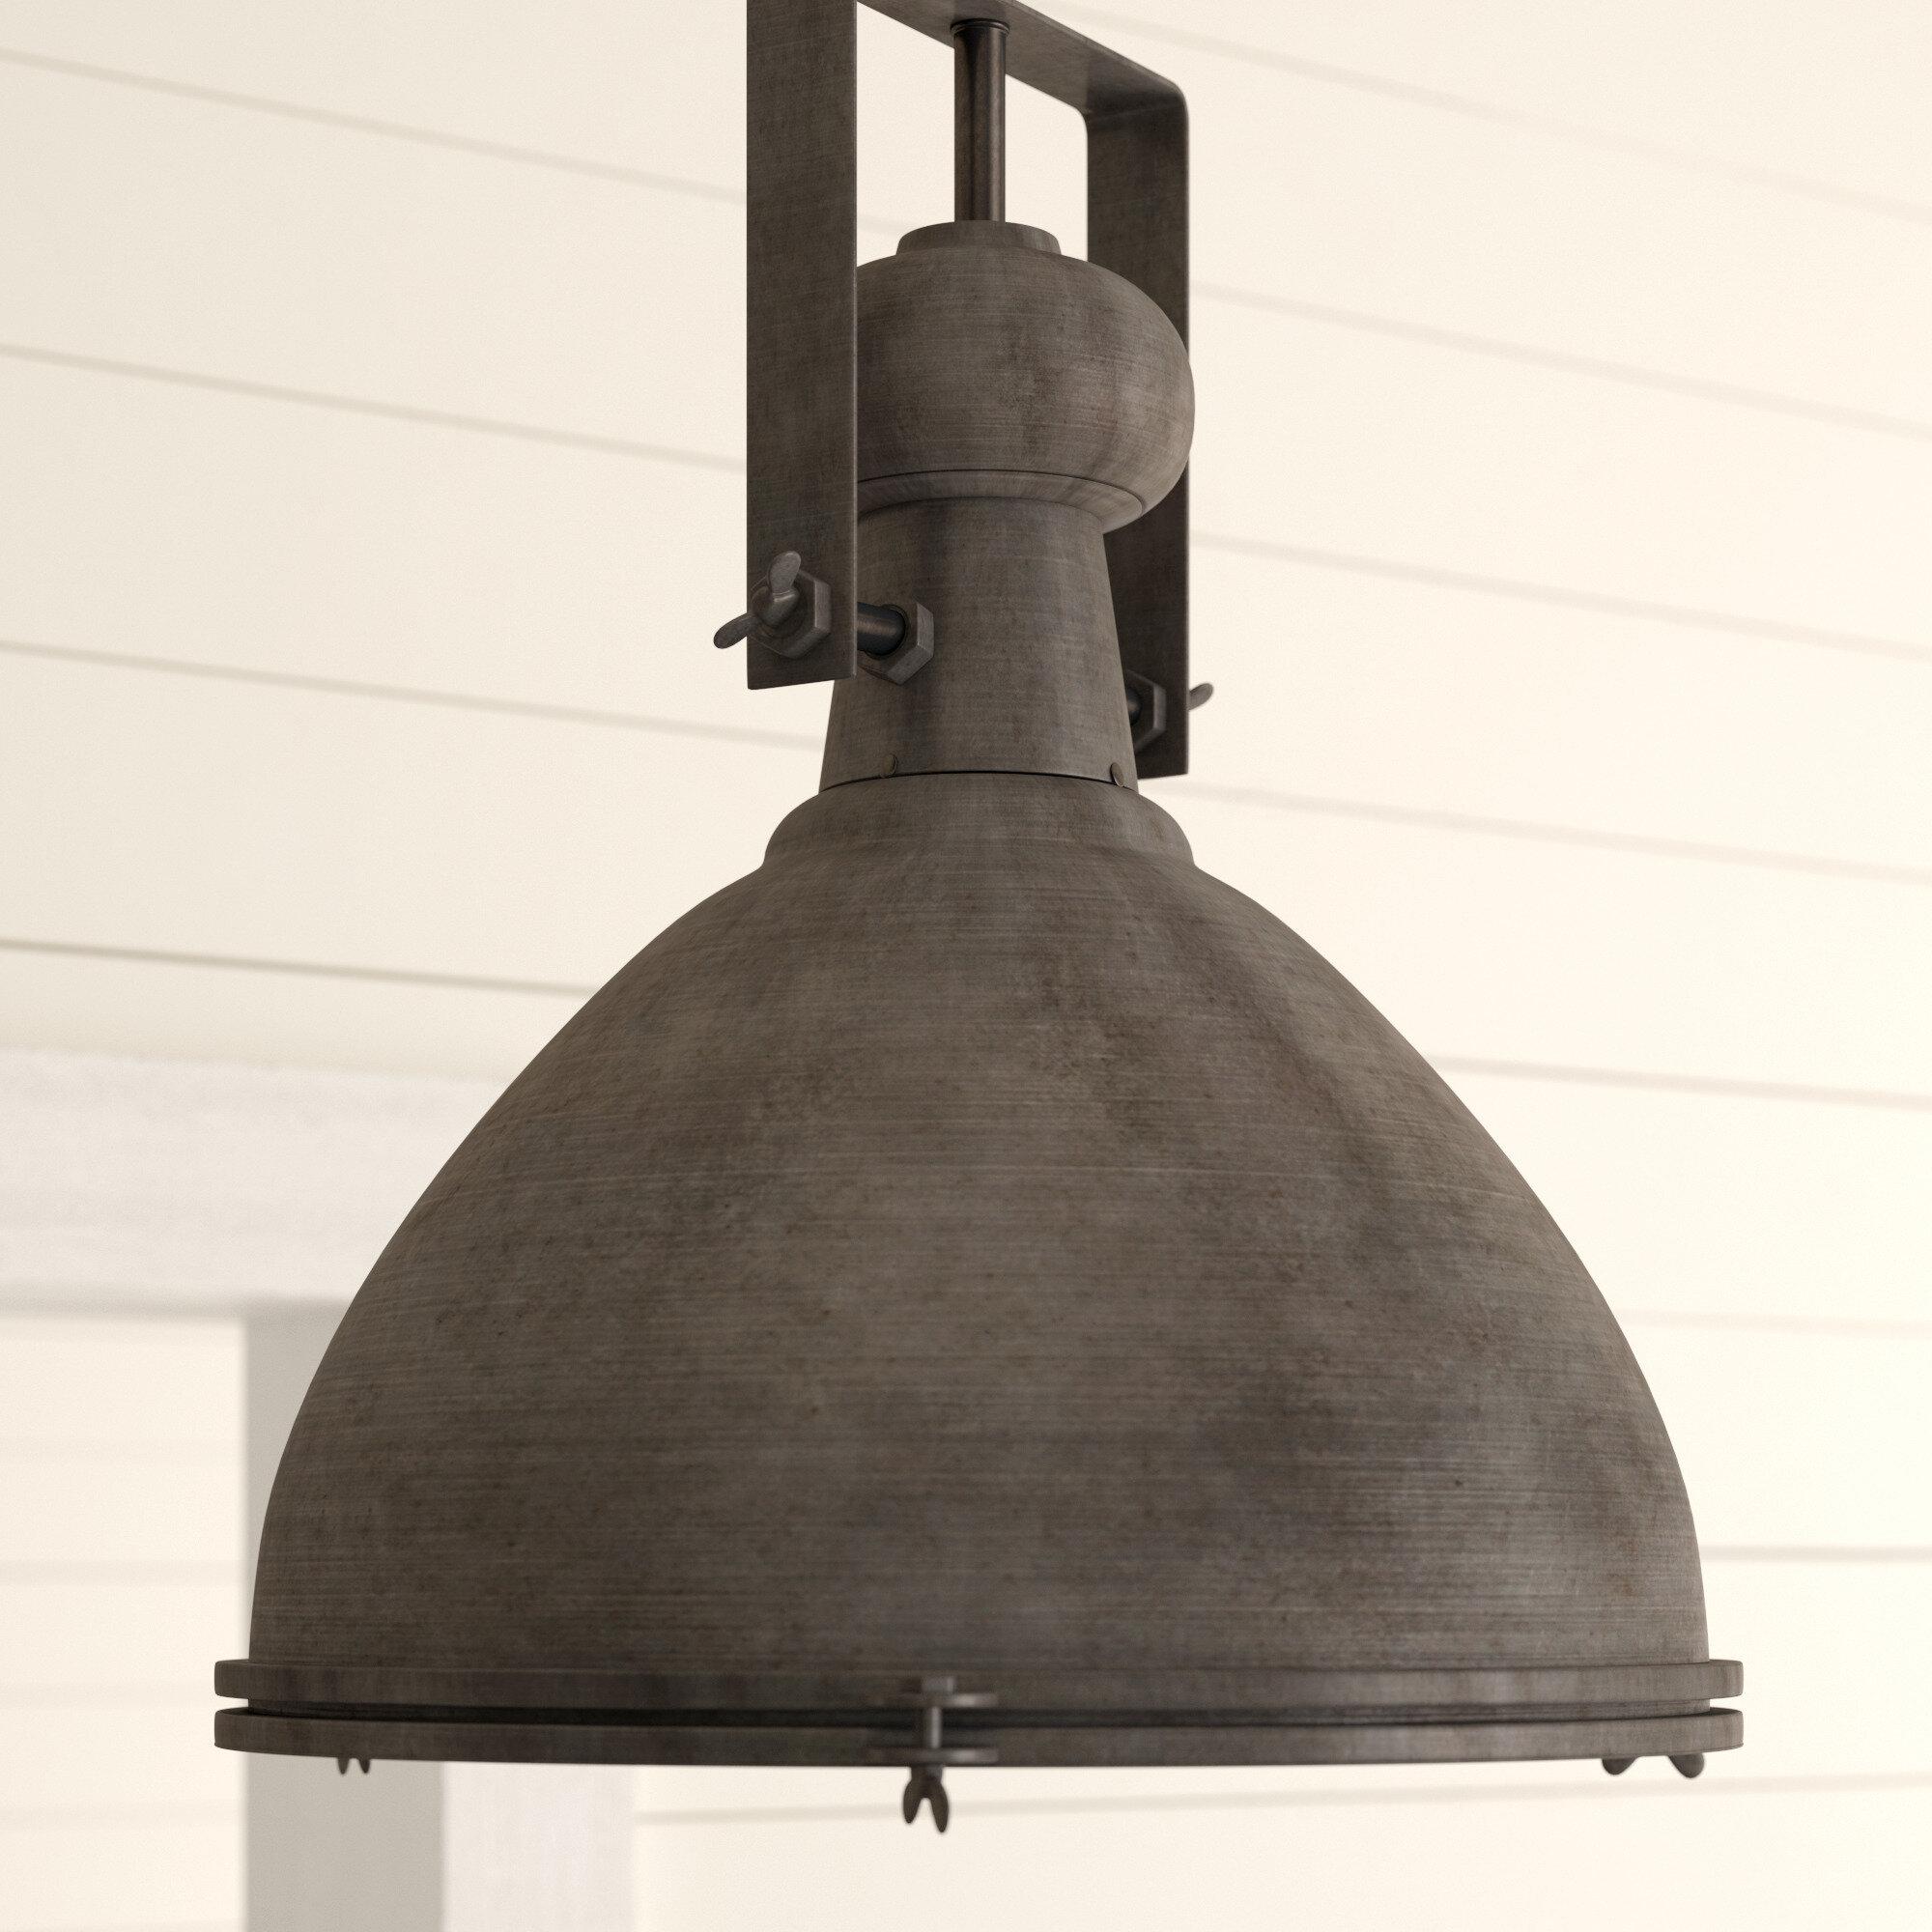 17 Stories Lavern 1 Light Single Dome Pendant Regarding Macon 1 Light Single Dome Pendants (Photo 17 of 30)